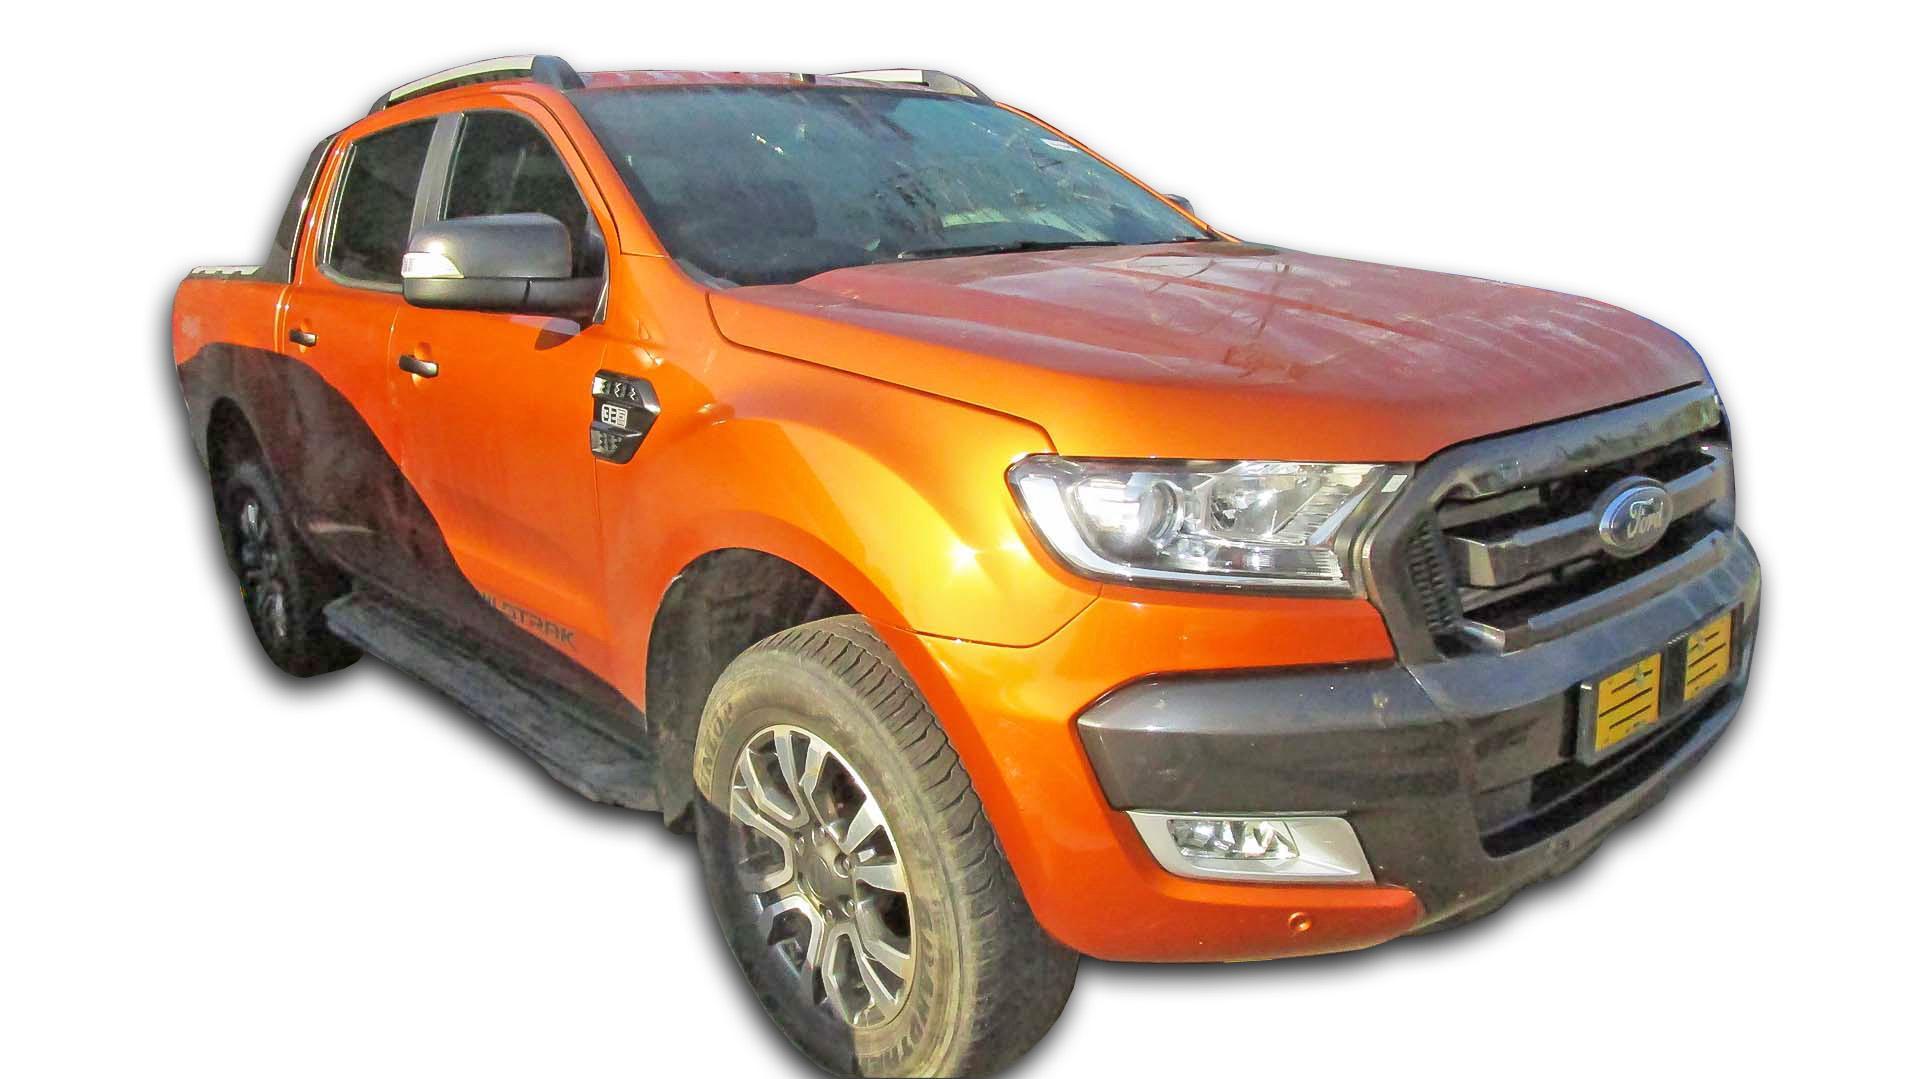 Ford Ranger 3.2TDCI 3.2 Wil